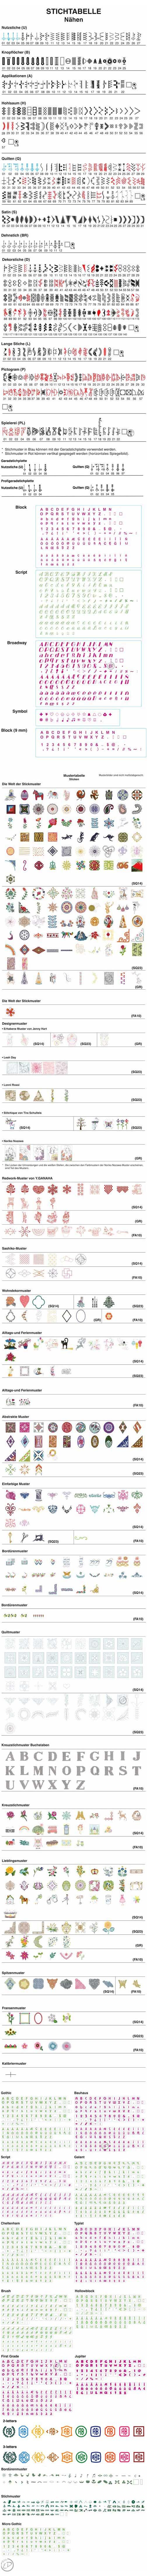 JANOME Horizon Quilt Maker Memory Craft 15000 Stichübersicht